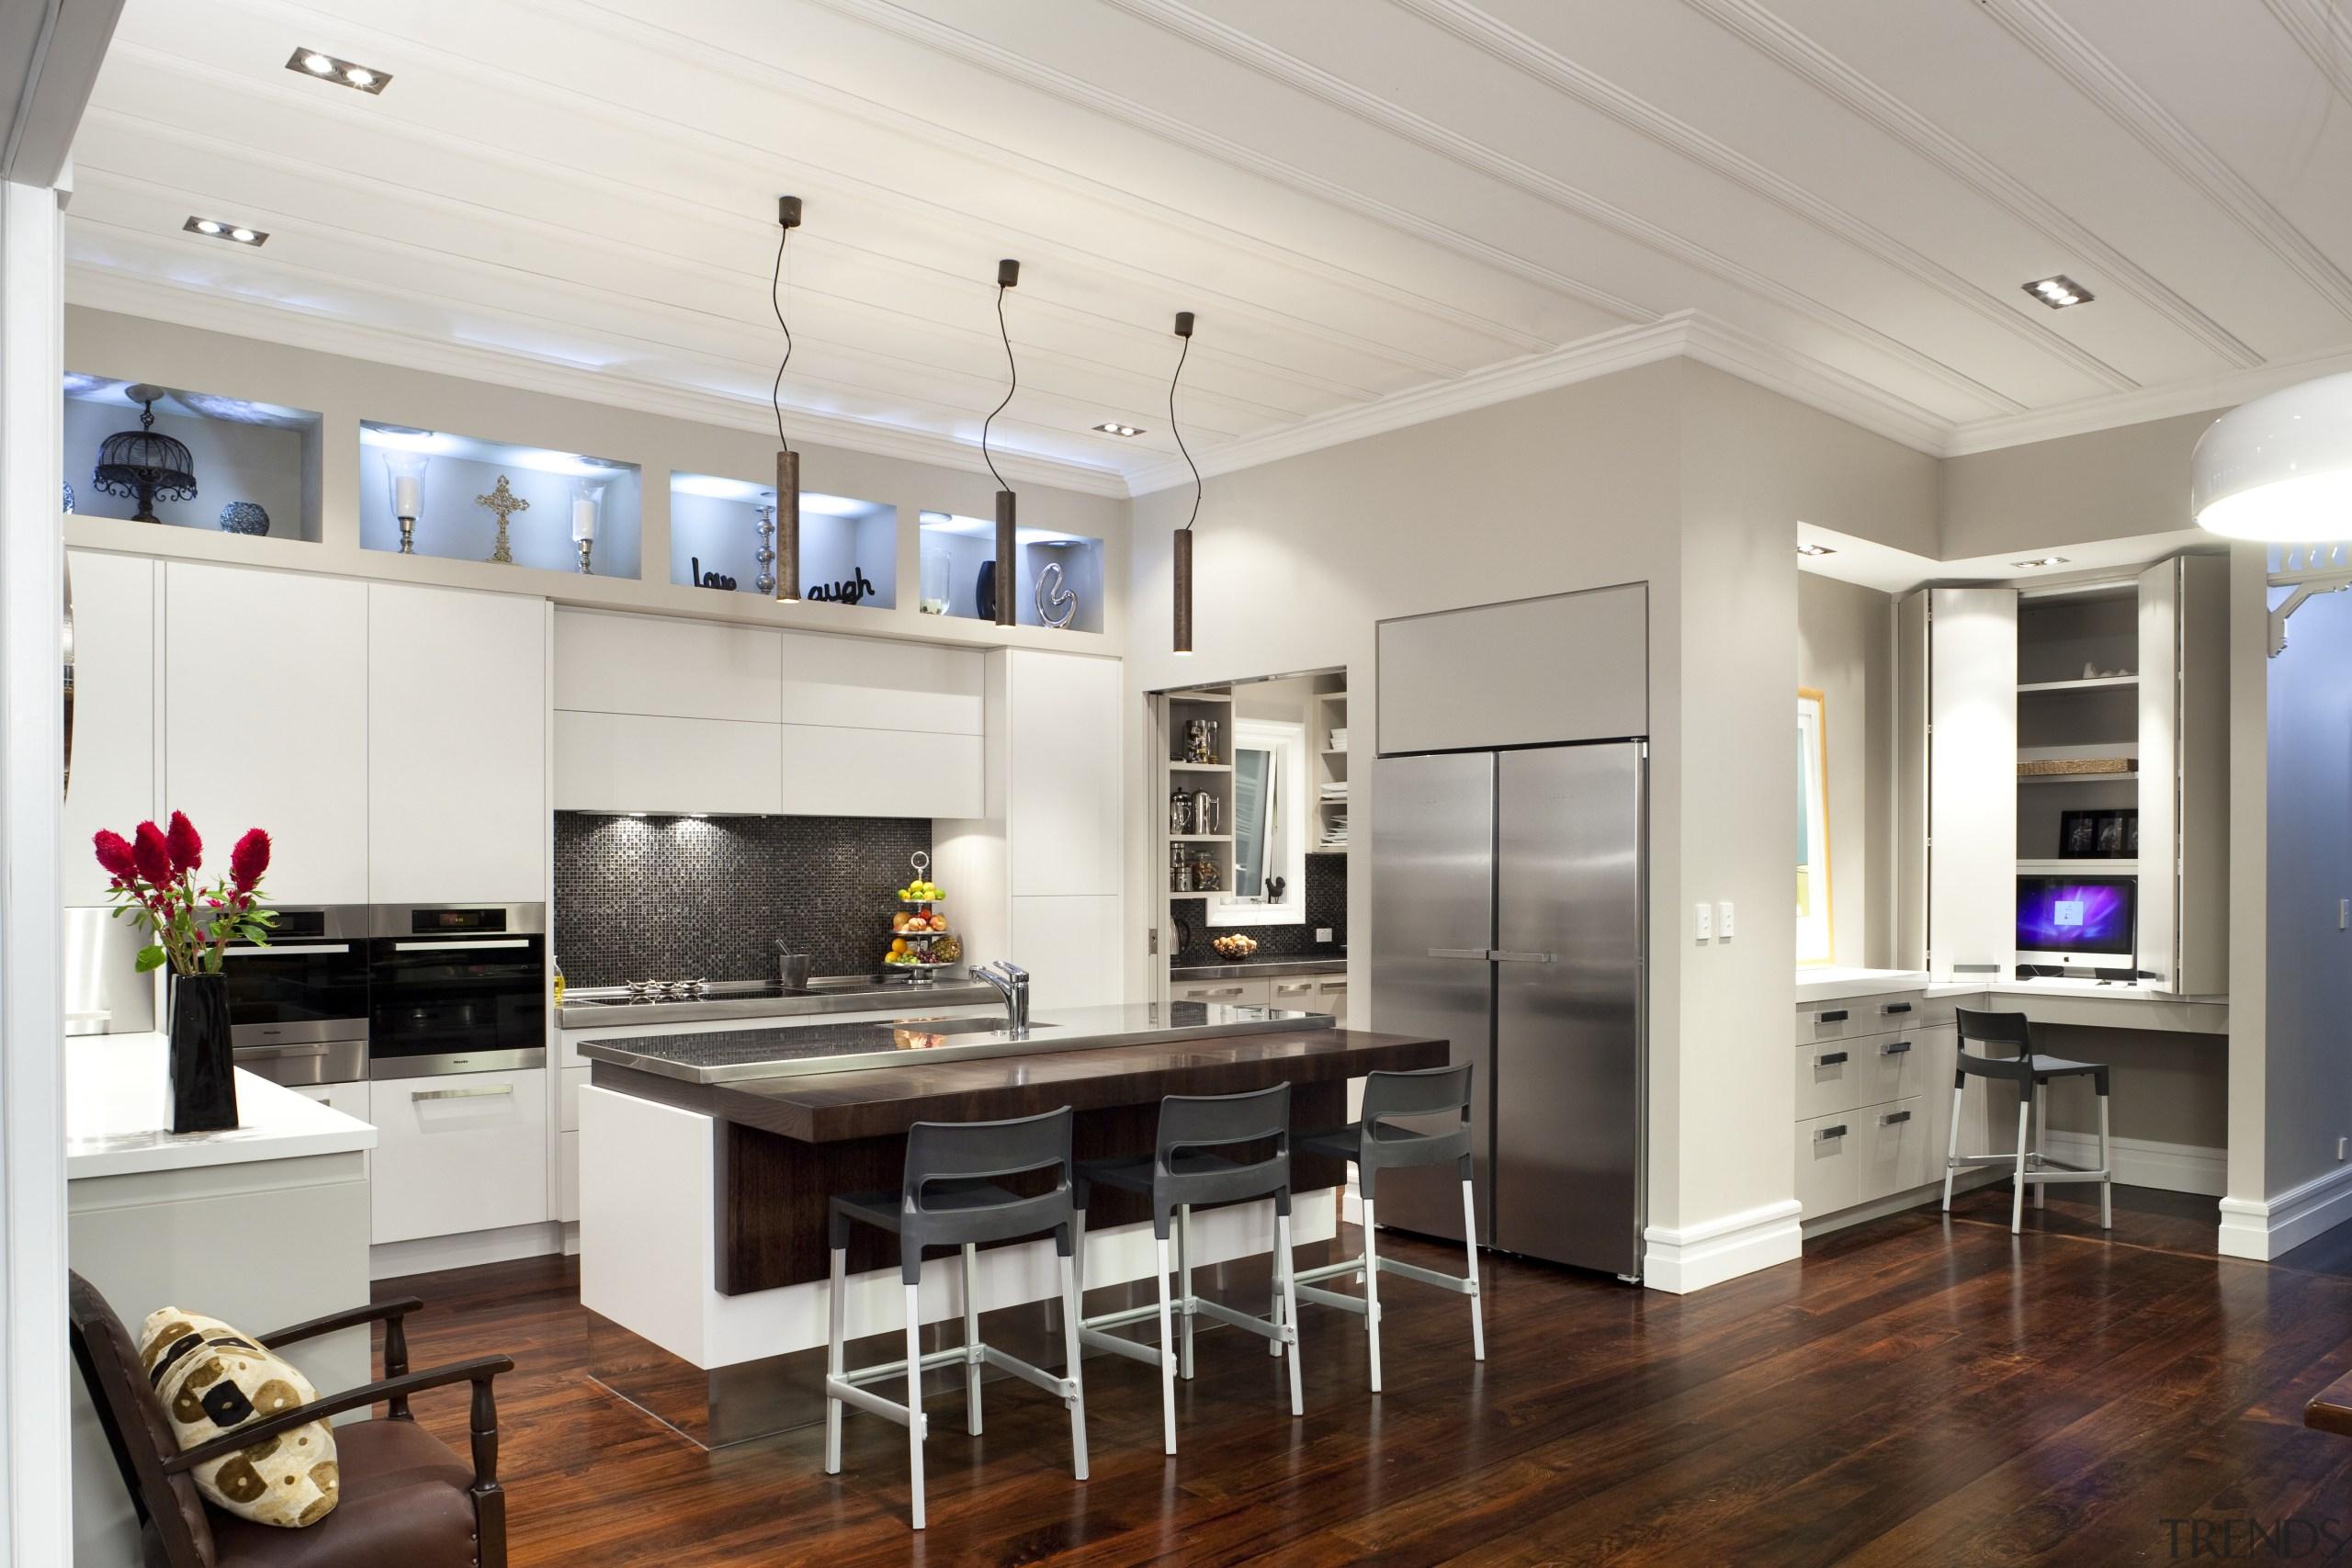 dark wooden floors from kitchen to mini study countertop, floor, interior design, kitchen, living room, real estate, room, wood flooring, gray